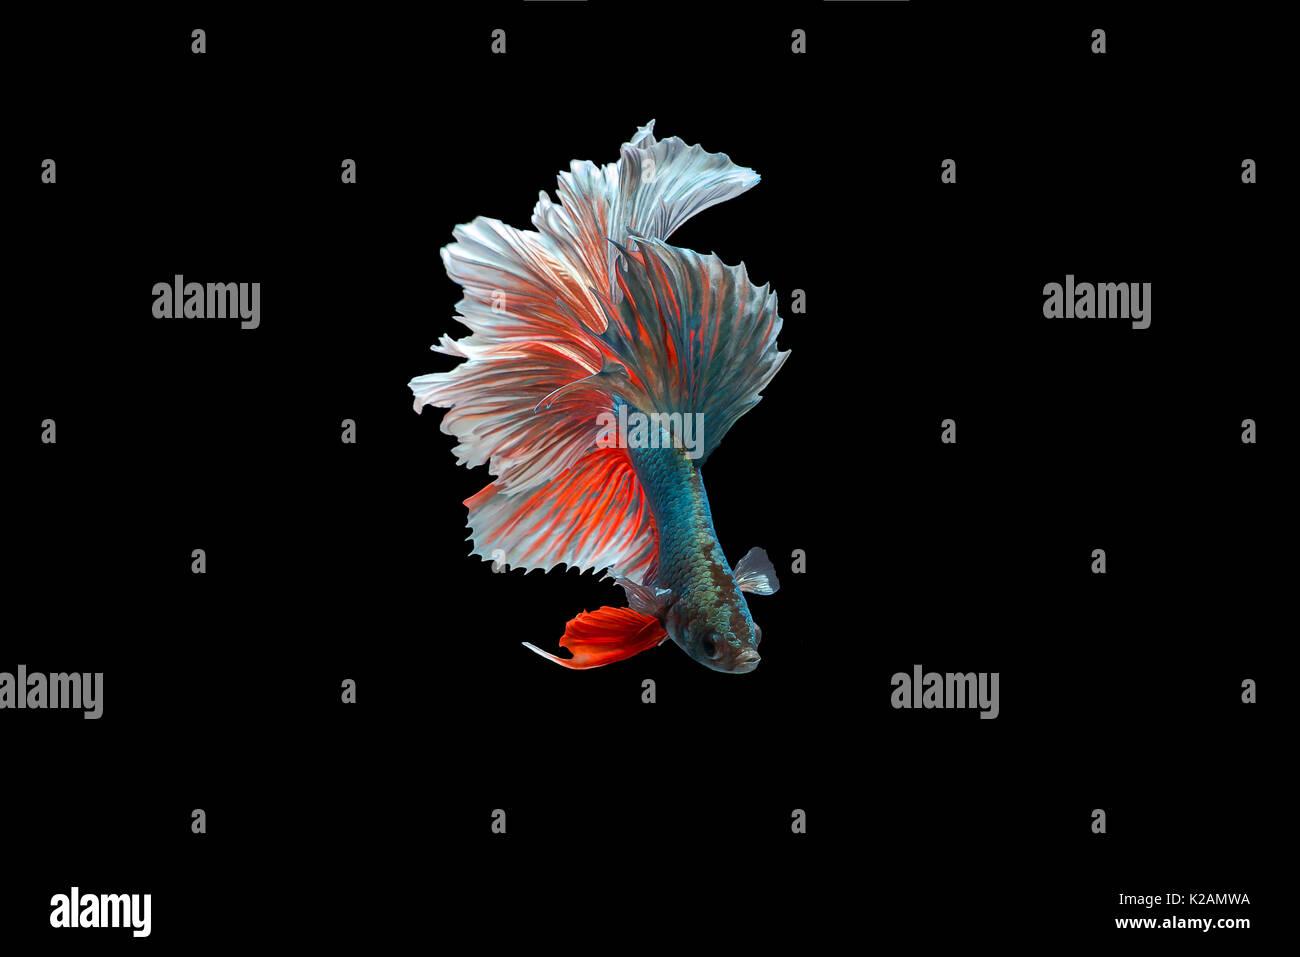 Beta Fighting Fish,Siamese fighting fish - Stock Image